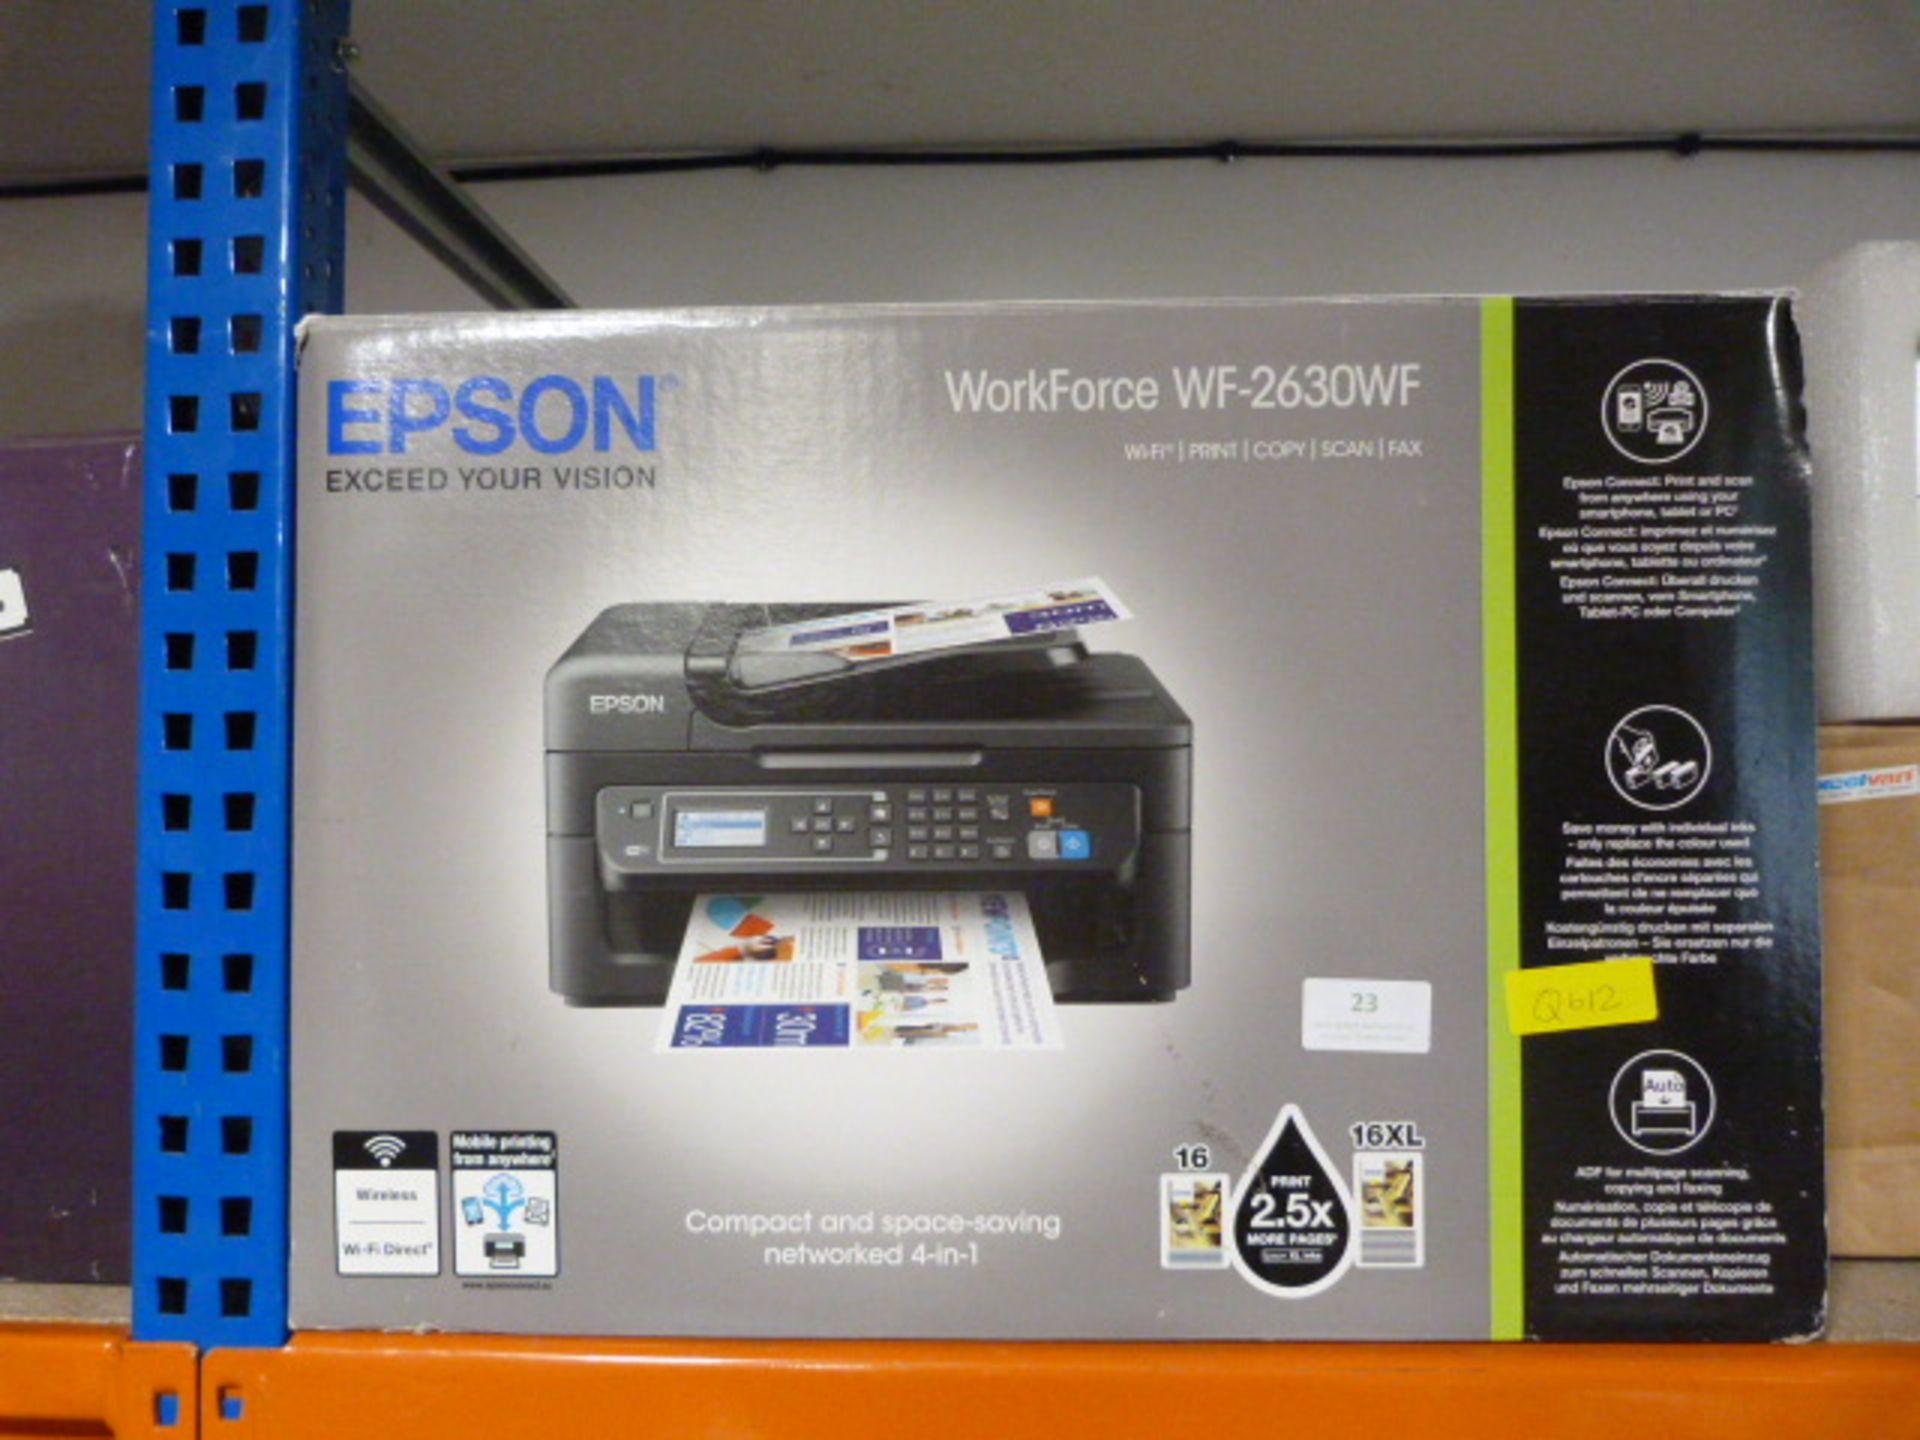 Lot 23 - Epson WF-2630 Printer